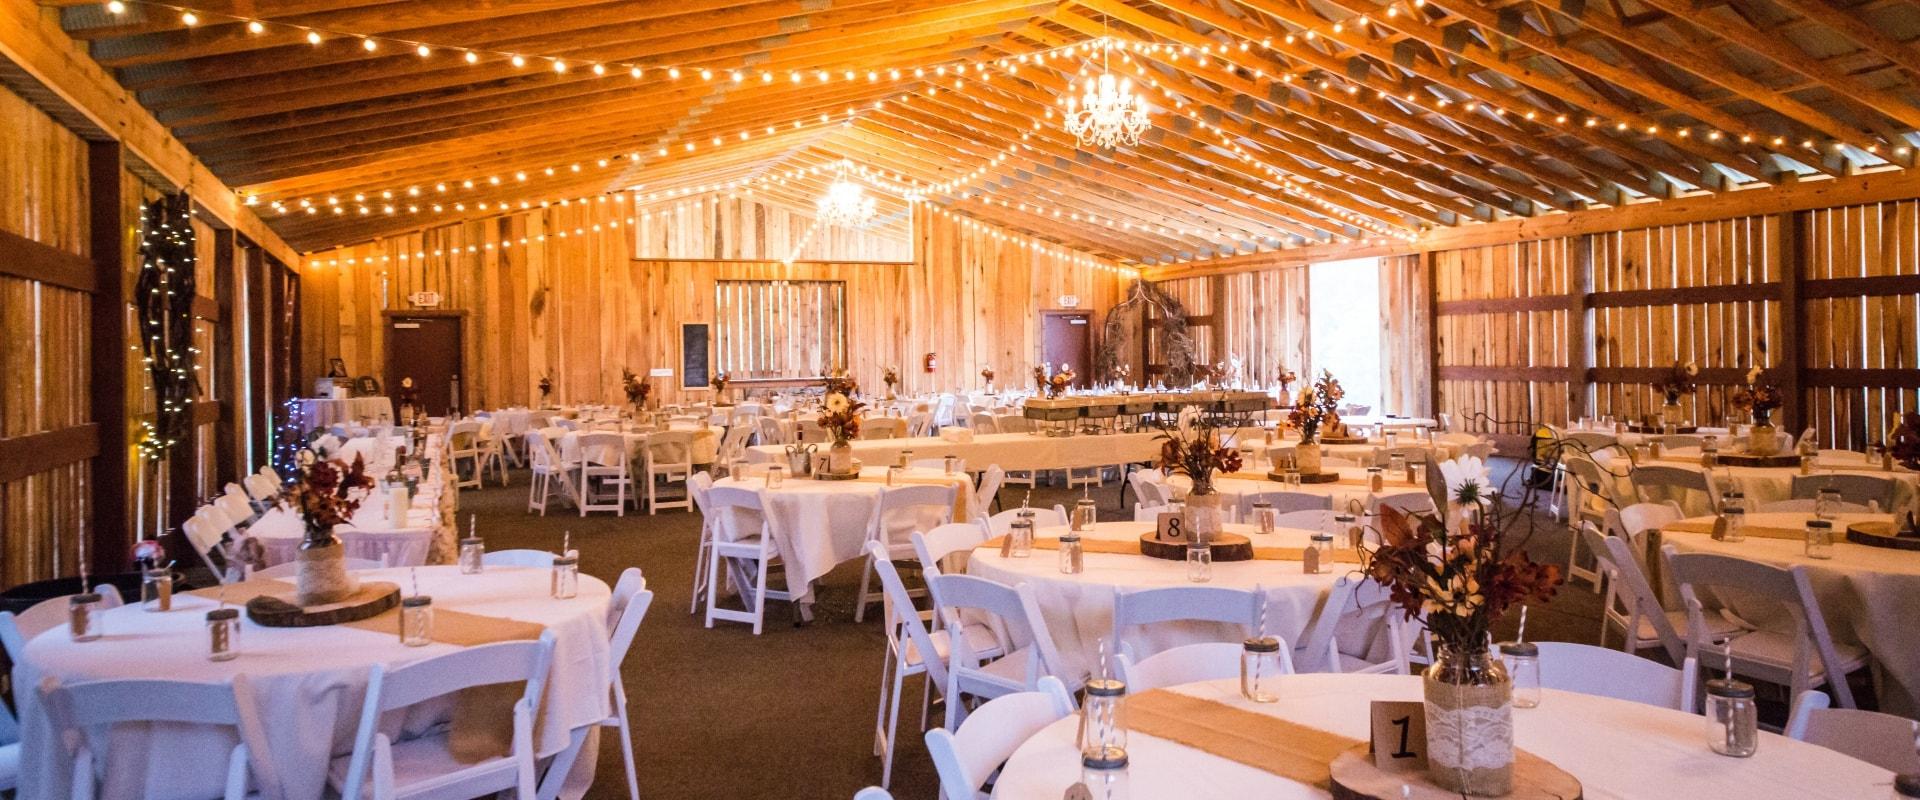 Wedding reception space rental